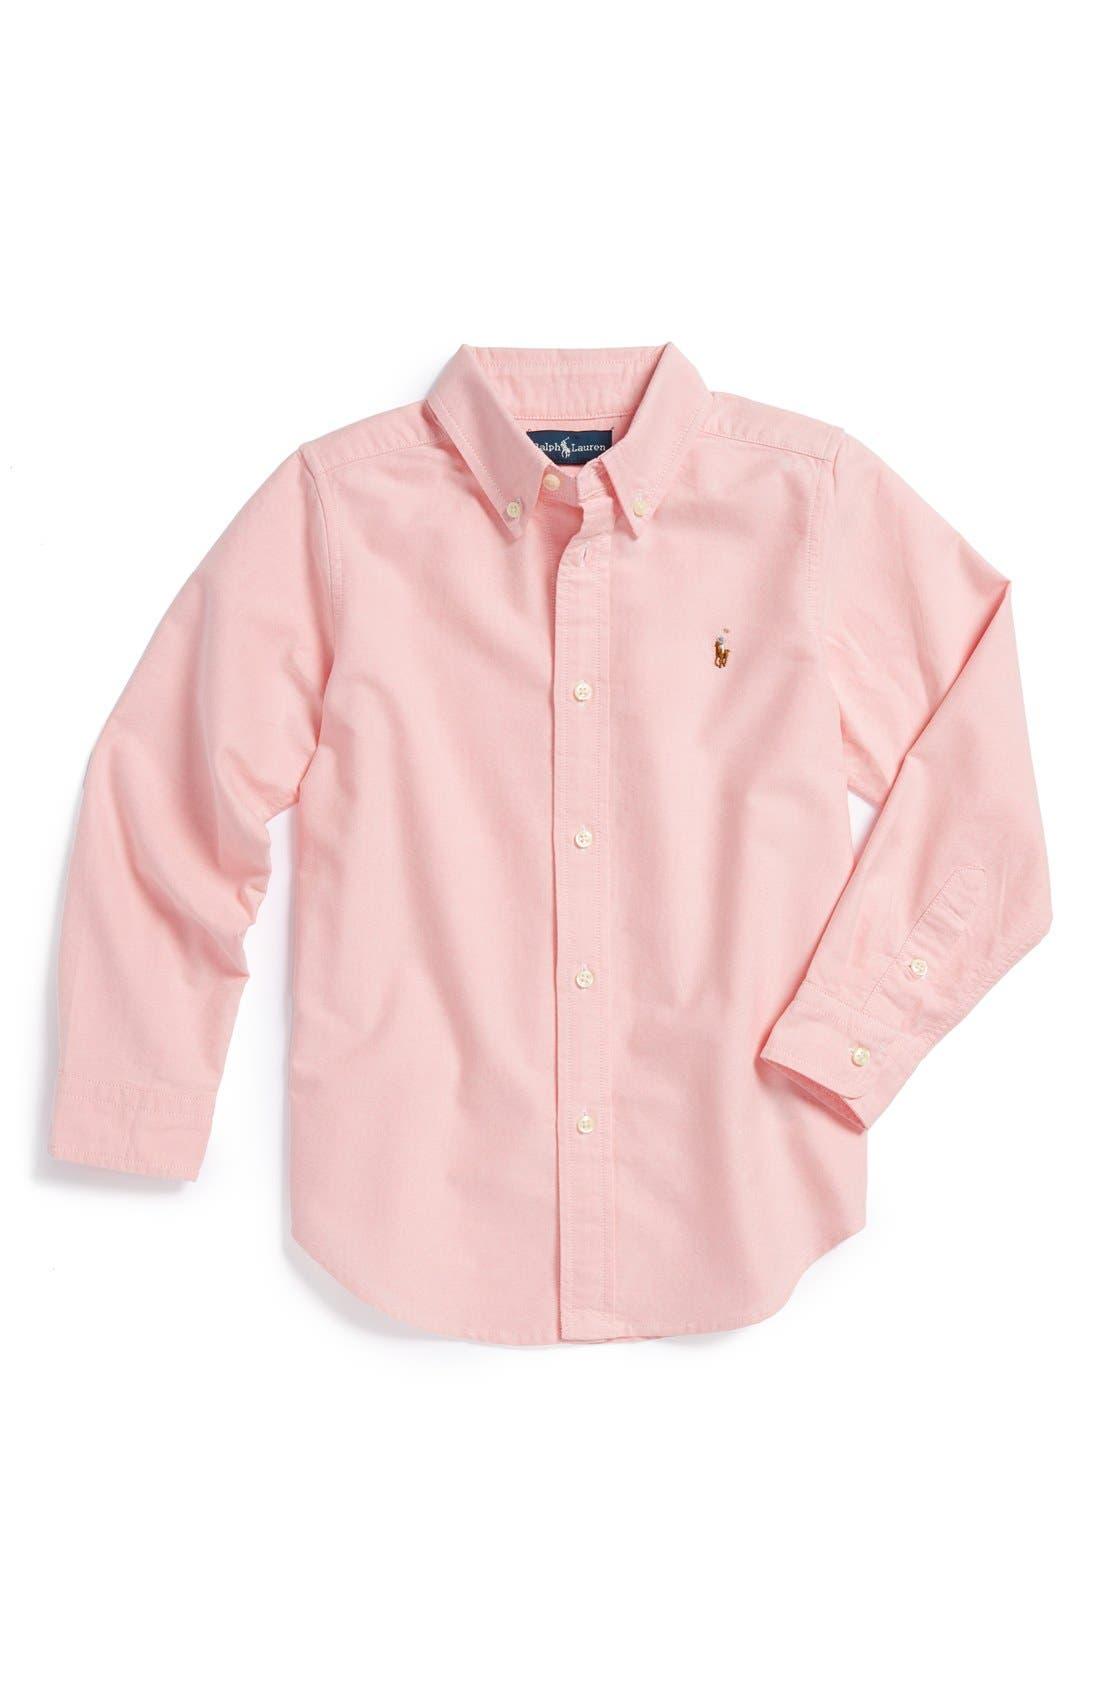 Alternate Image 1 Selected - Ralph Lauren Oxford Sport Shirt (Big Boys)